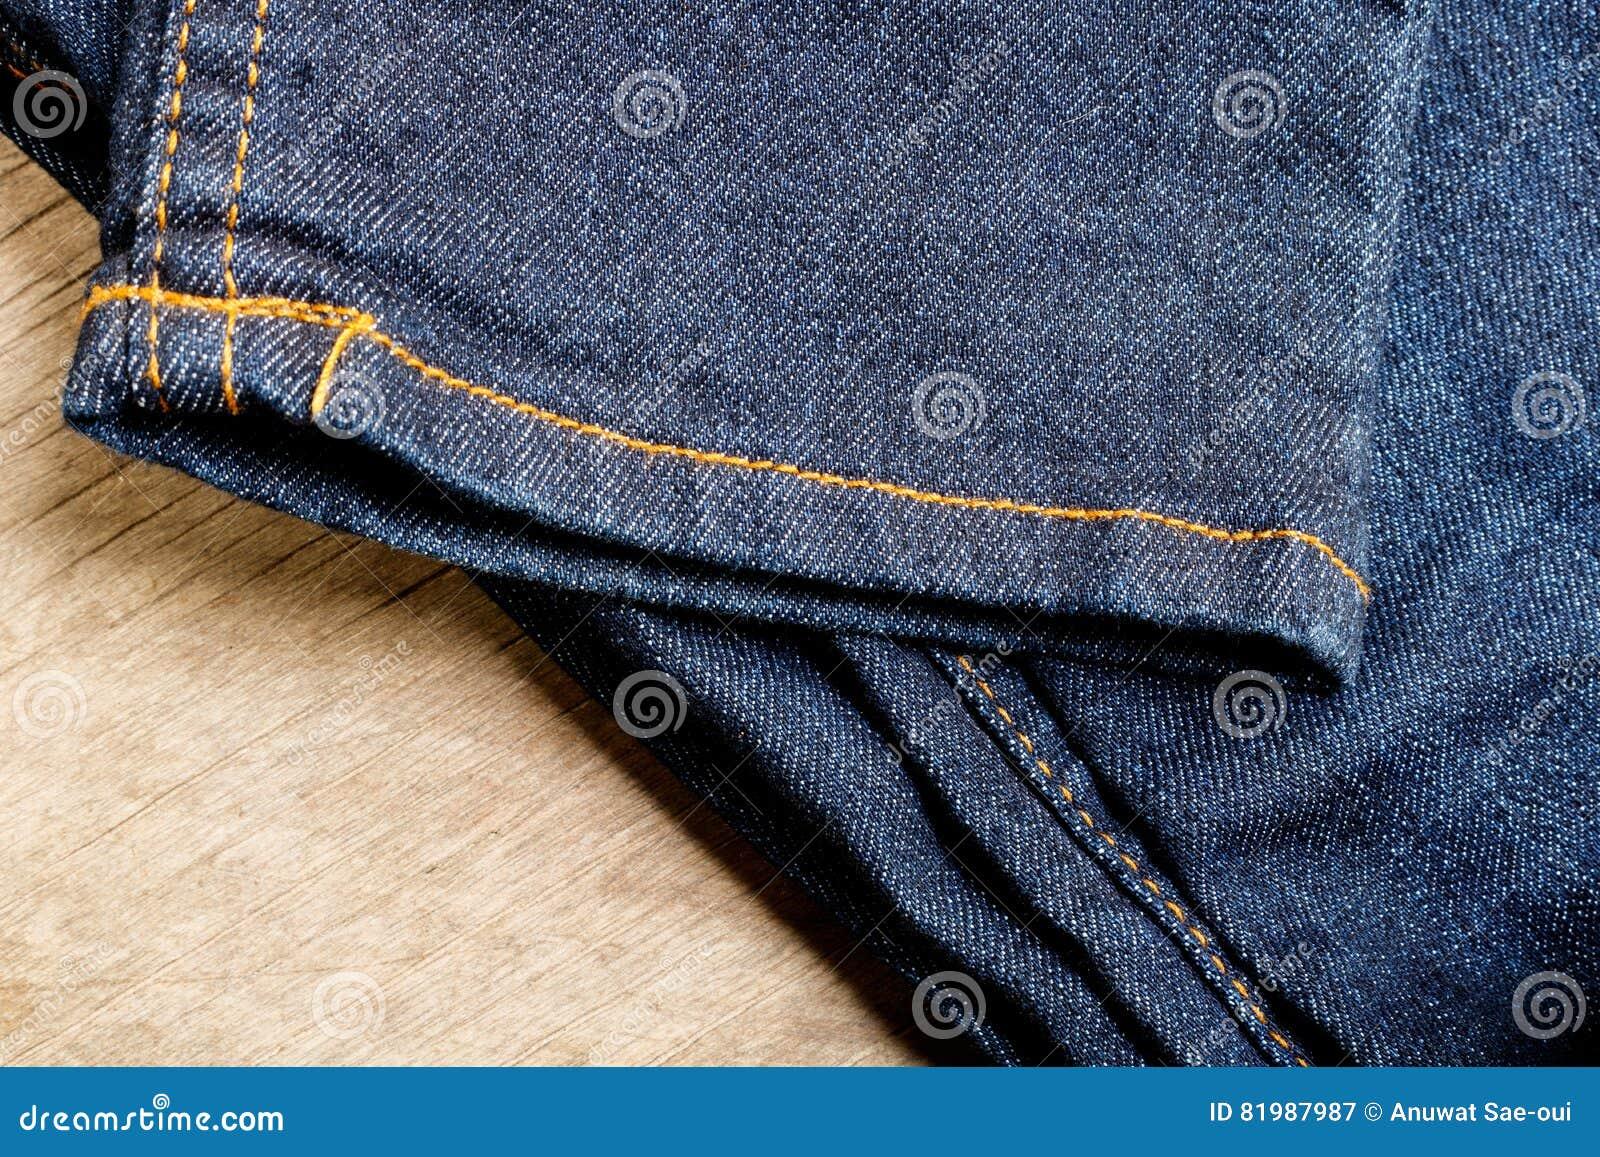 Jeans of denim